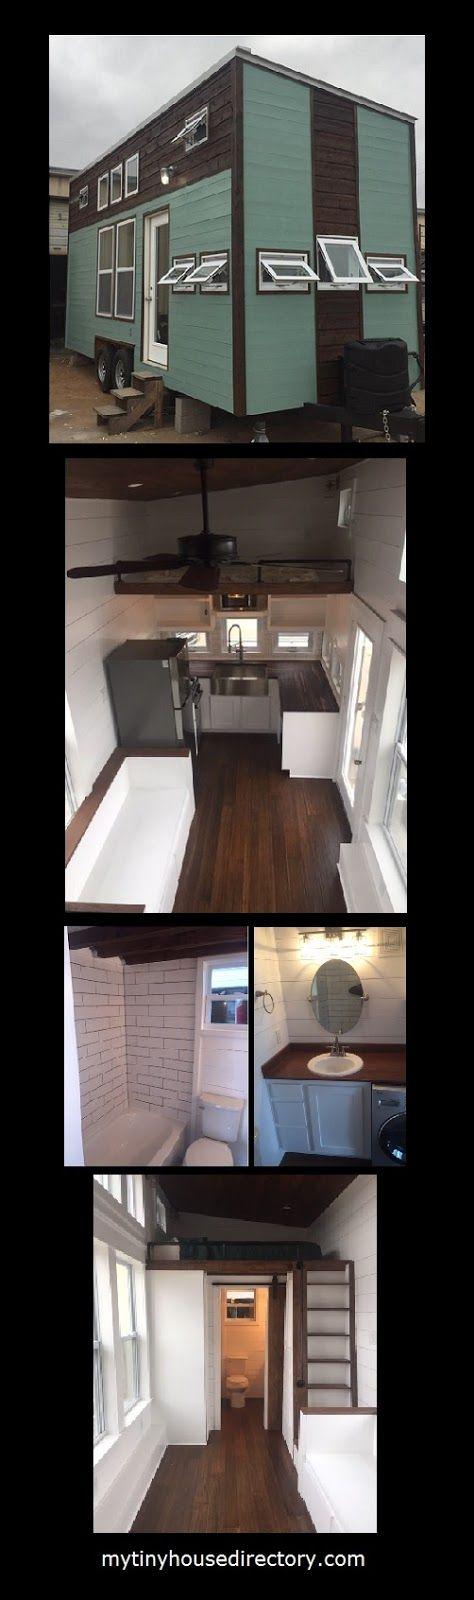 mytinyhousedirectory: 24' Modern Rustic Farmhouse For Sale